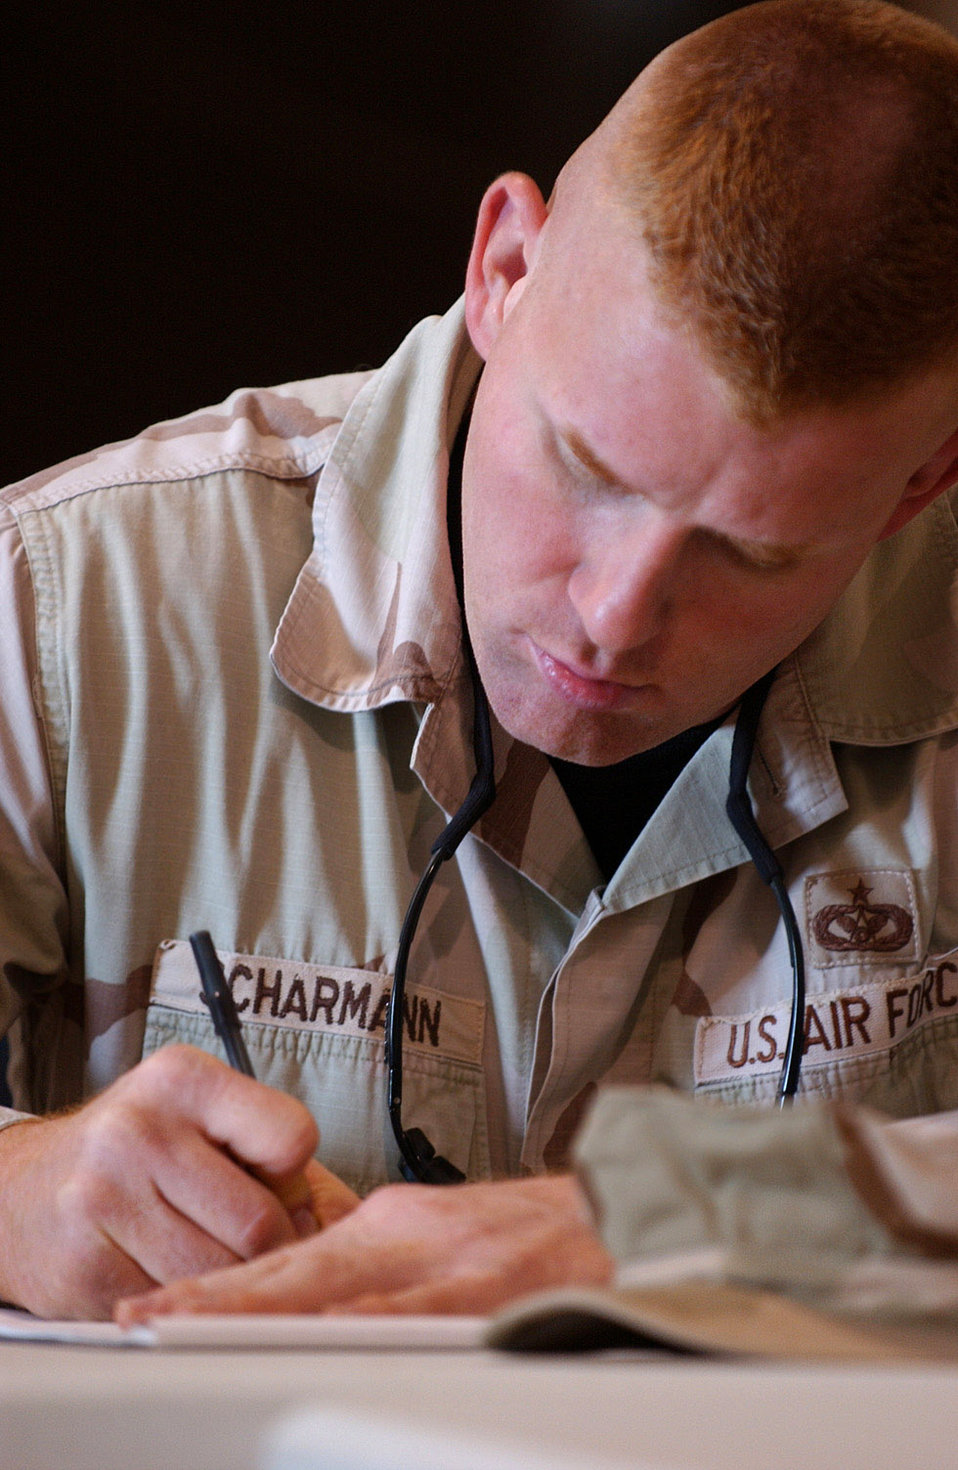 Senior NCOs mentor junior sergeants in Iraq